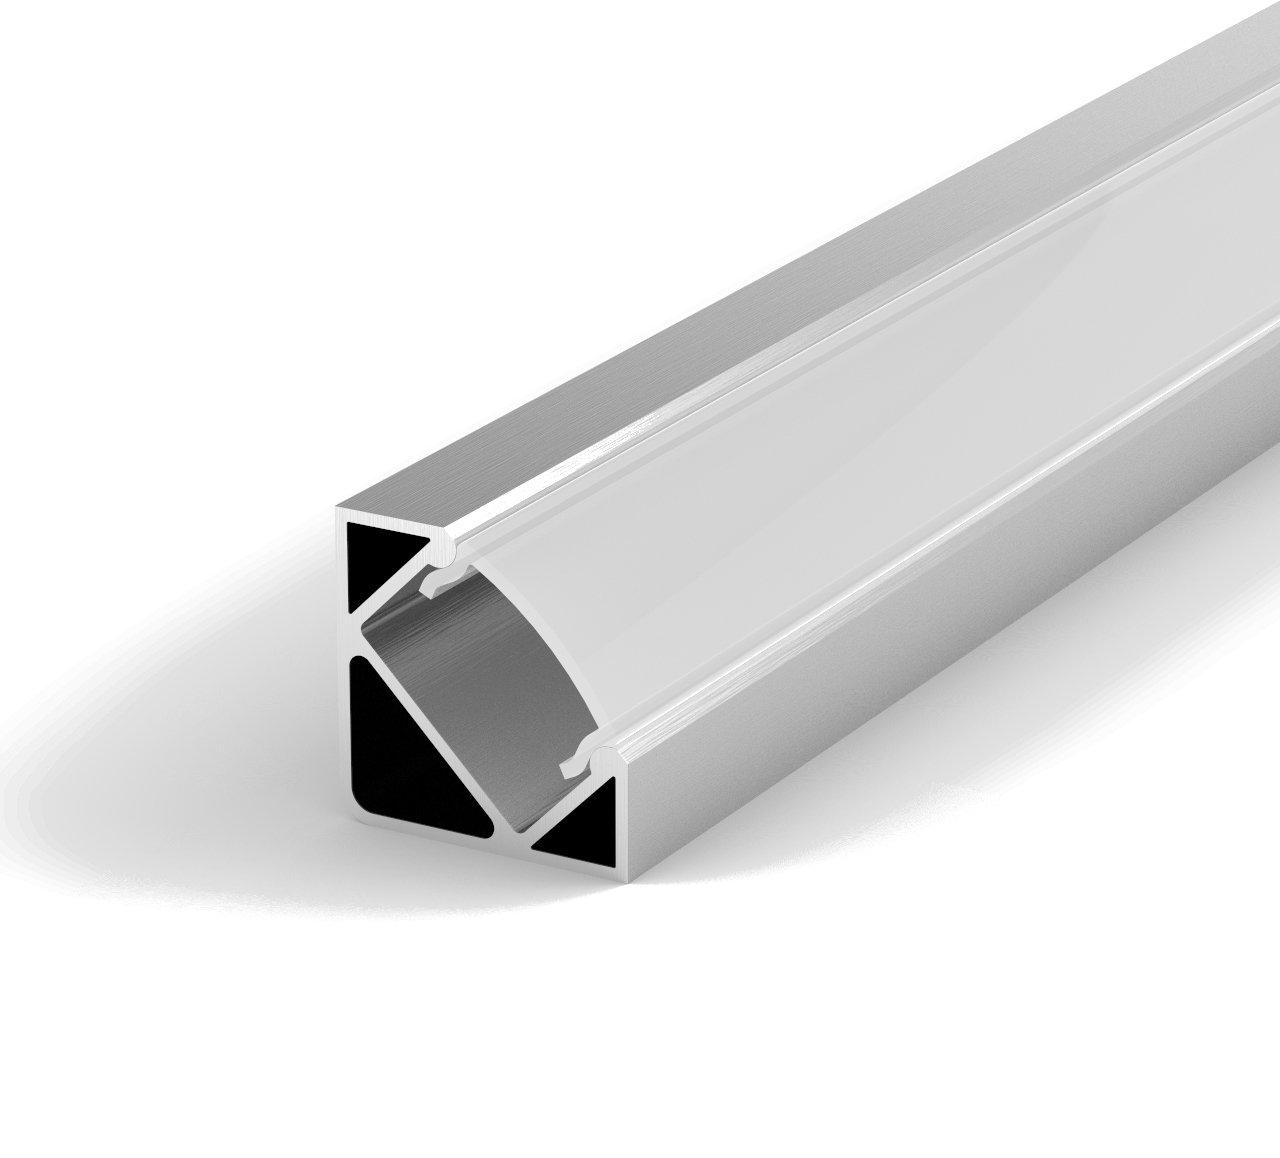 SET: LED Profil, 100cm Profil LED 45° für LED Streifen, aluminium ...